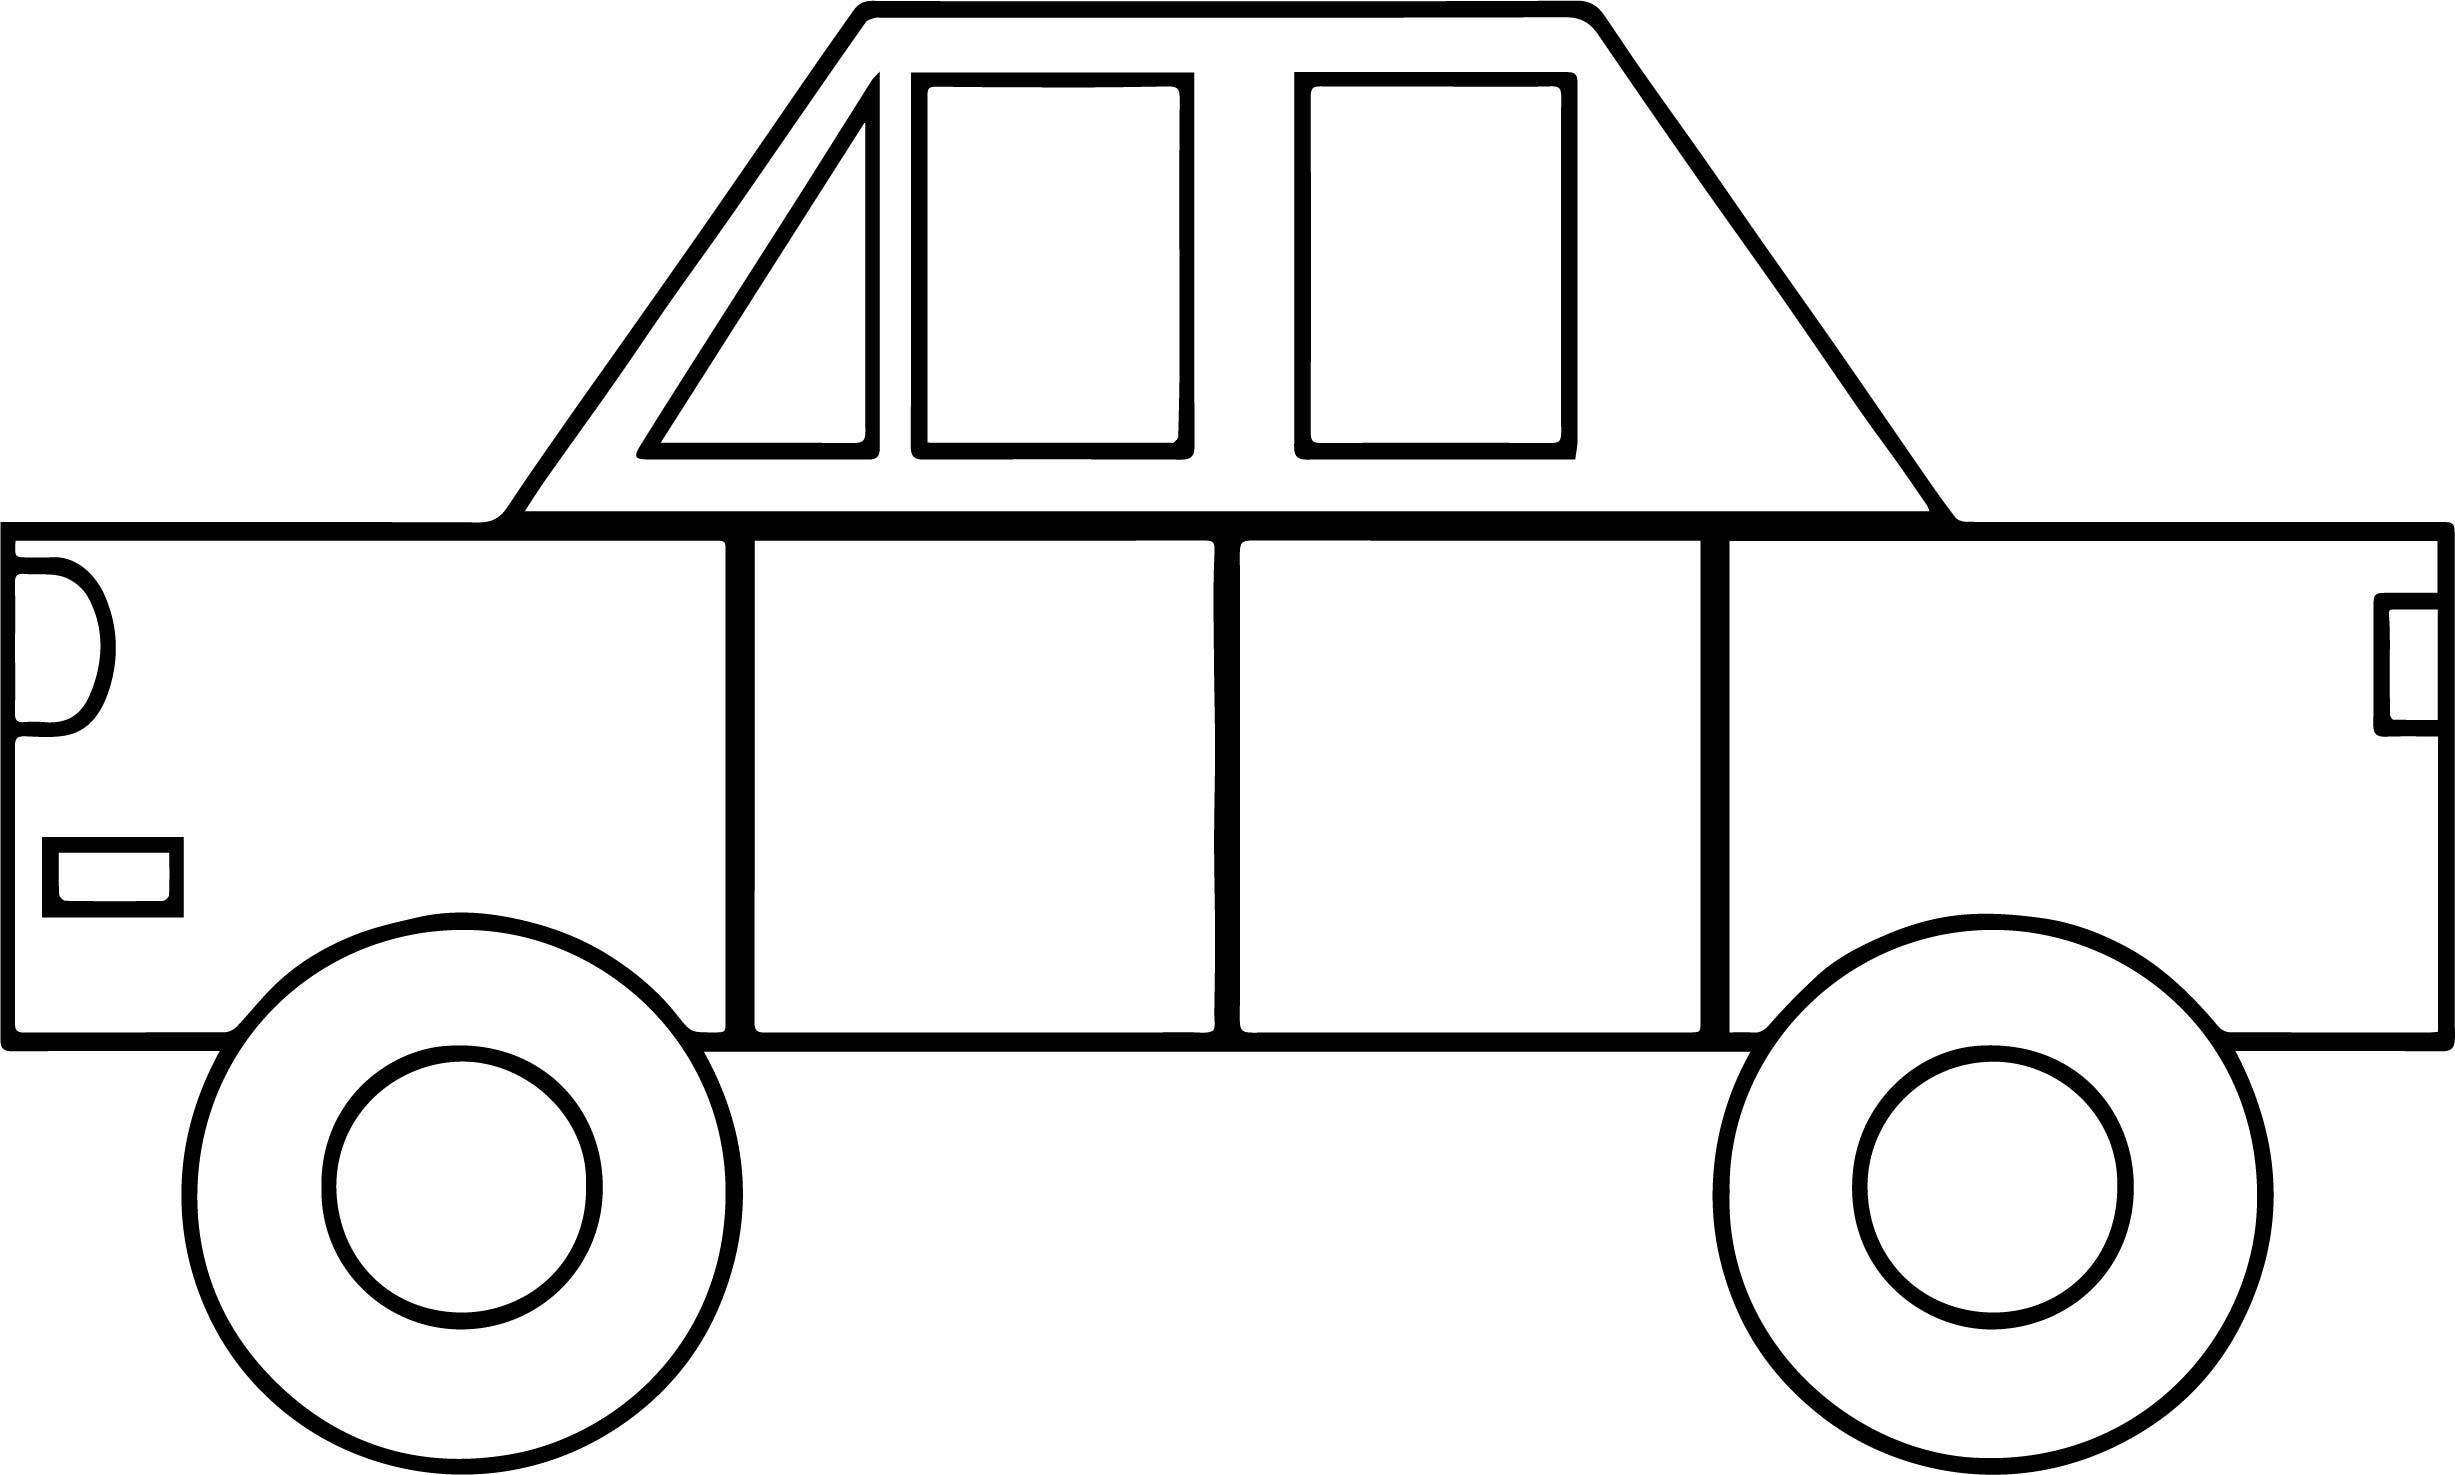 Box Car Coloring Pages : Box car coloring page wecoloringpage